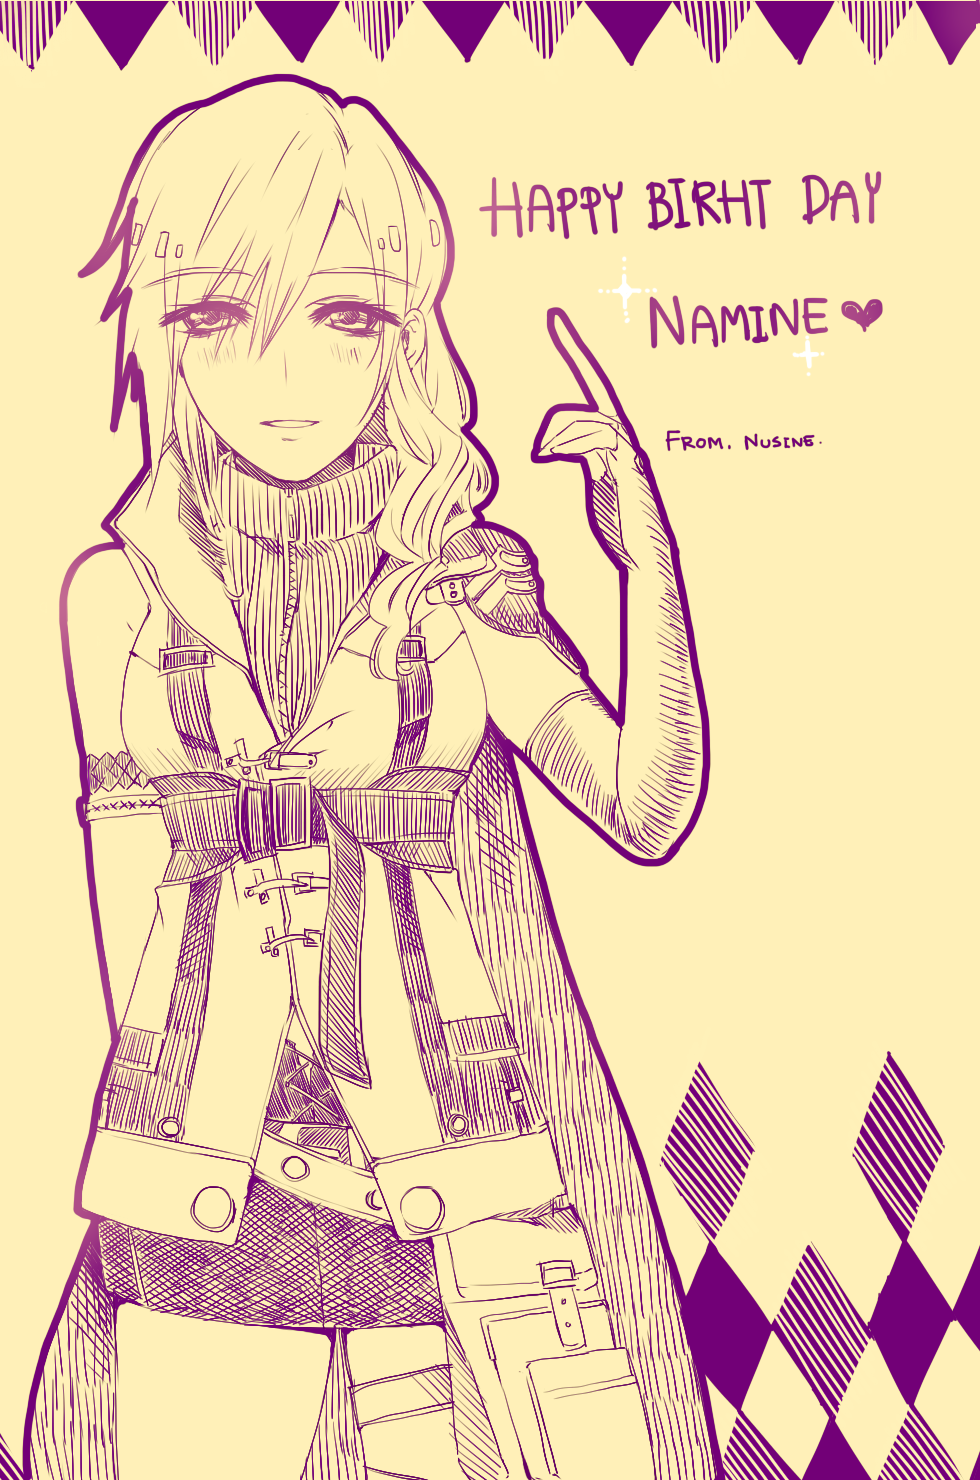 HBD Namine by NuSinE